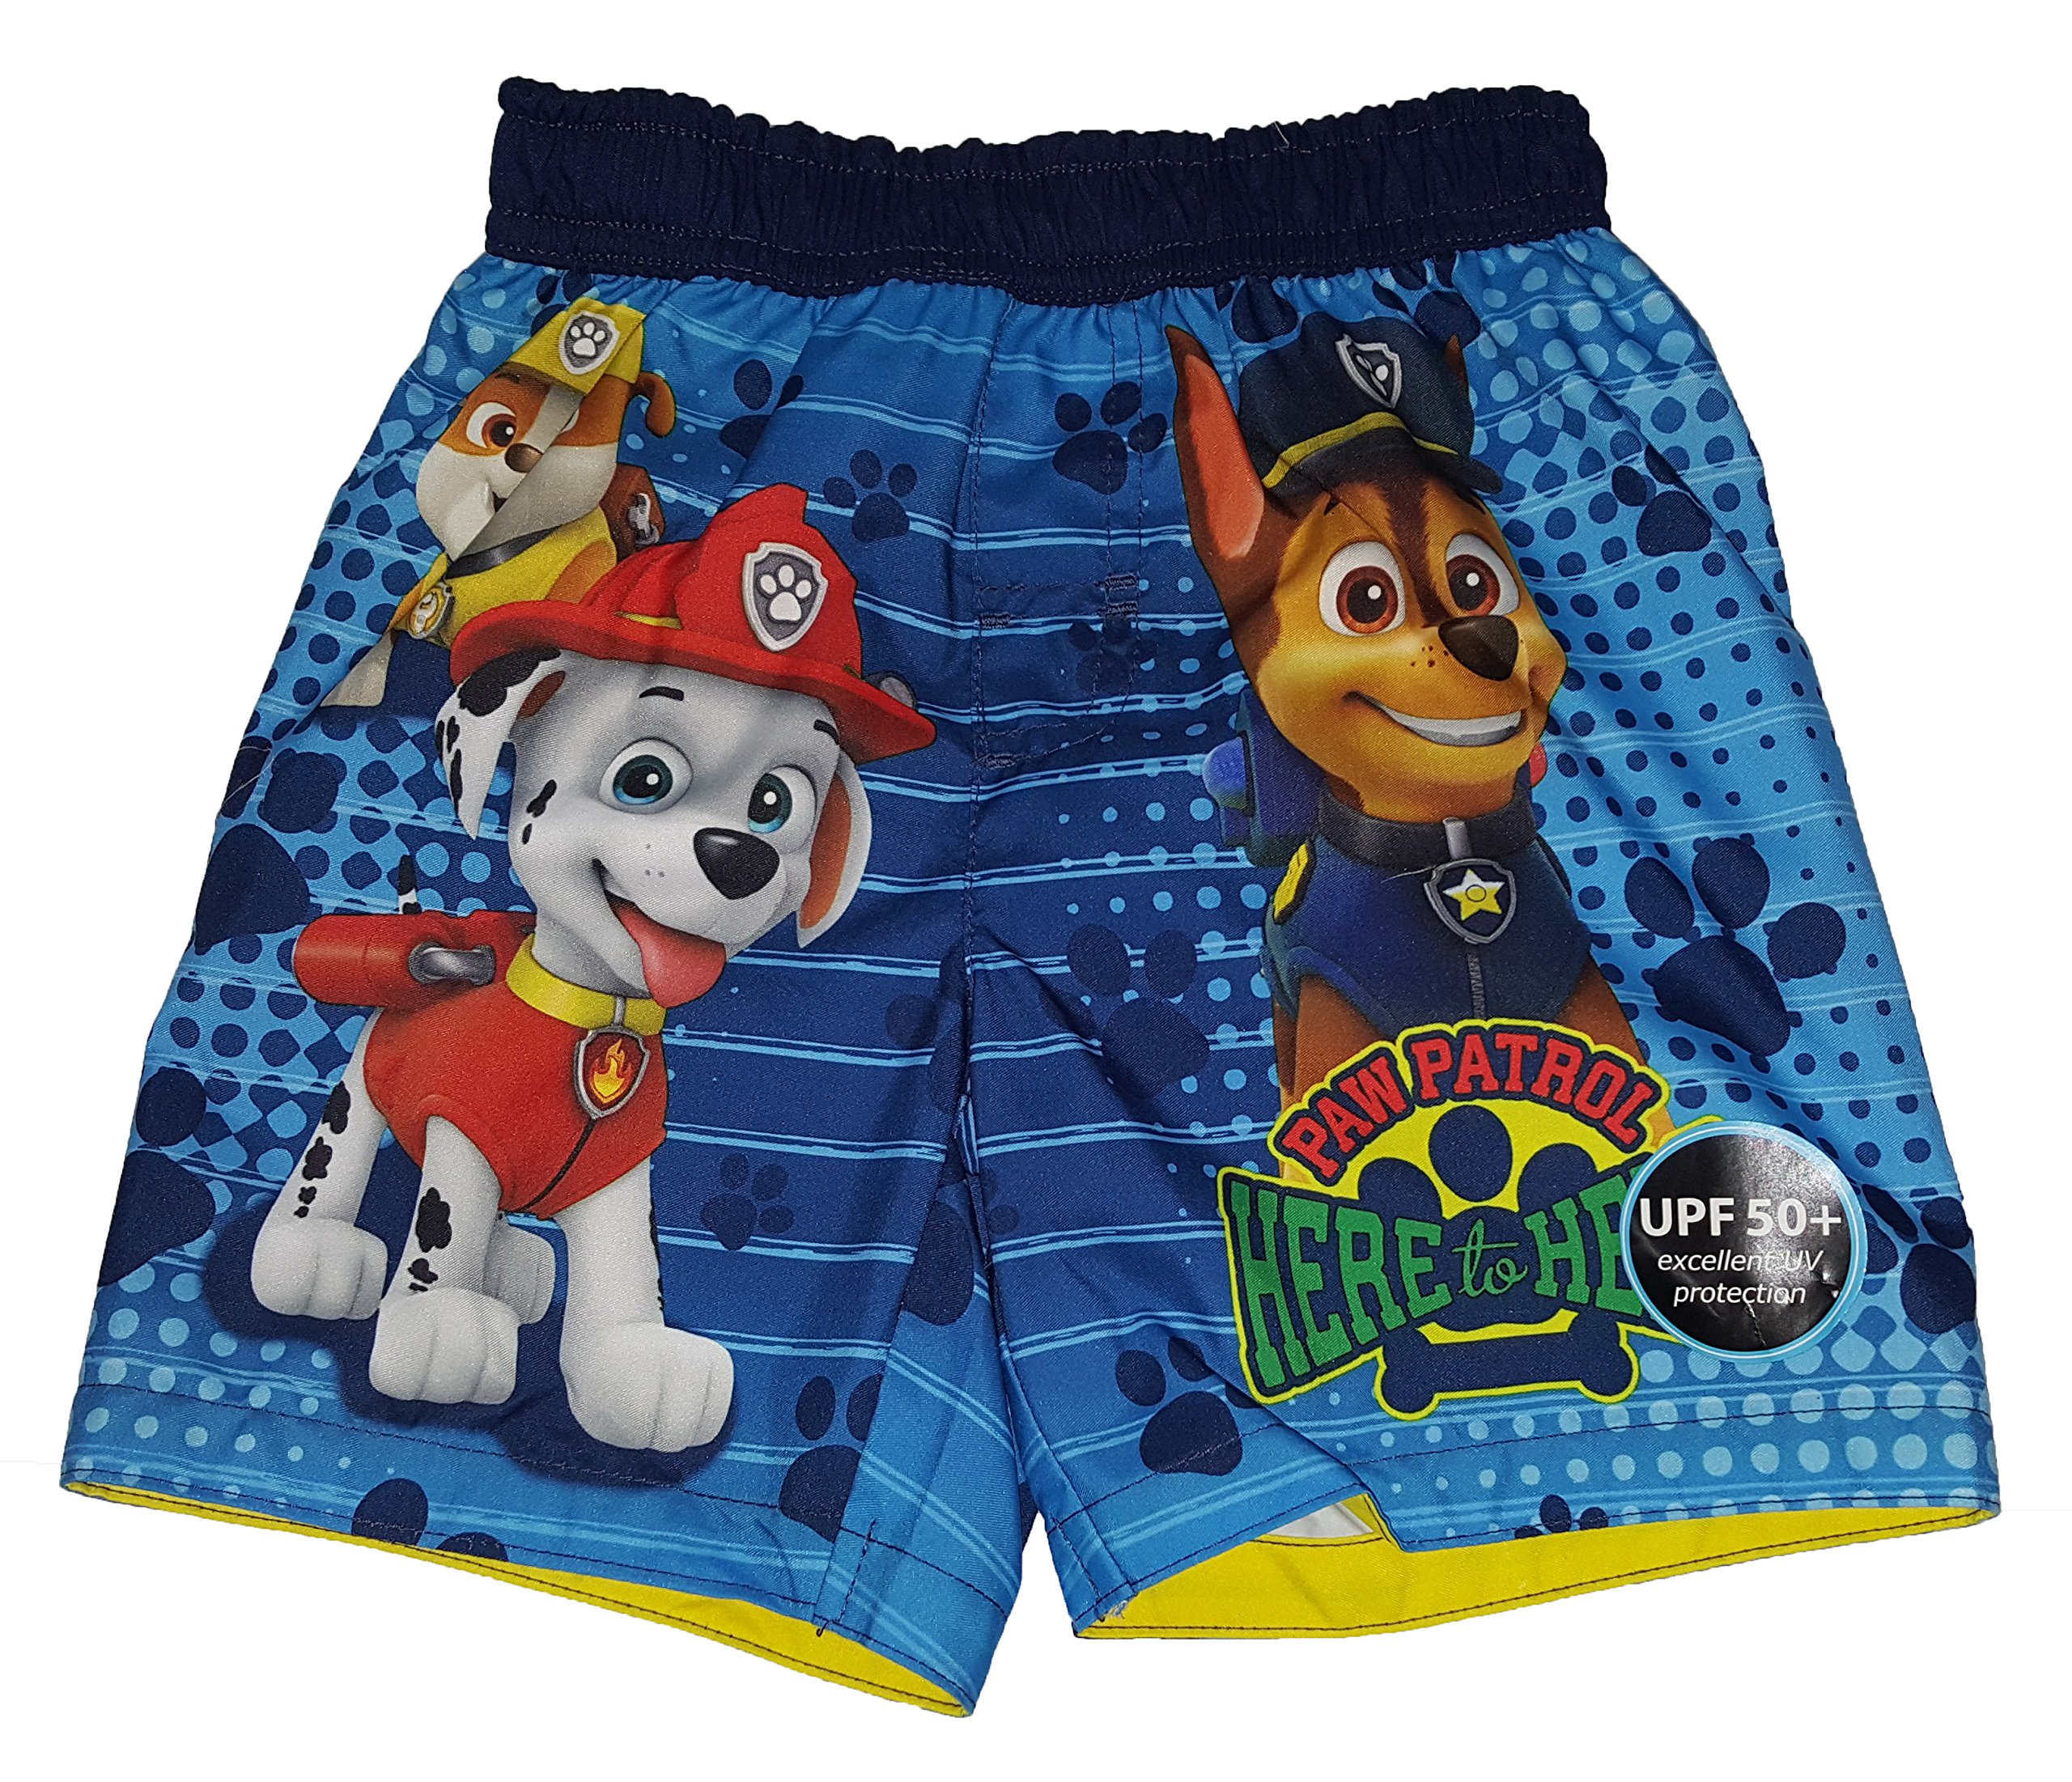 Toddler Boys Paw Patrol Here to Hear Blue Swim Short Trunk - 2T